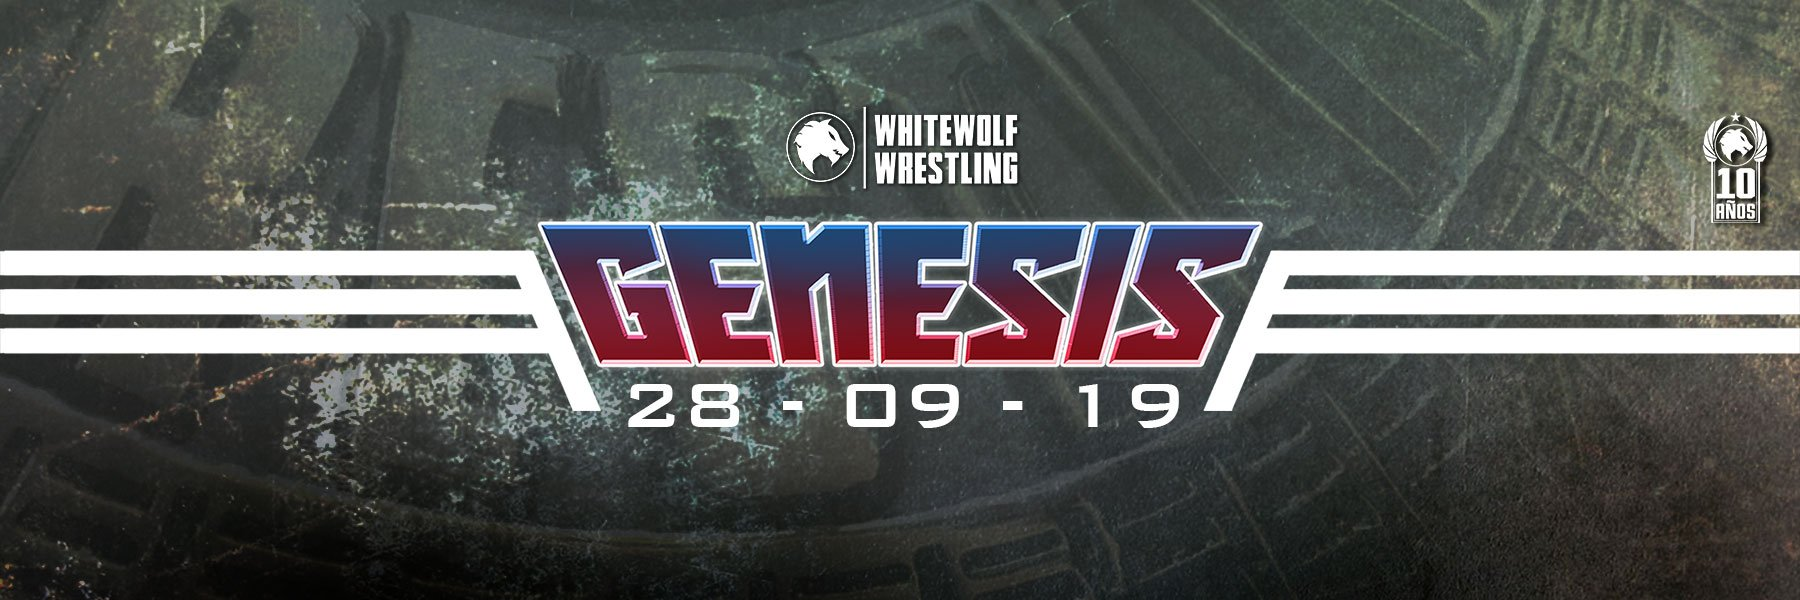 10x01 Génesis - Full Show - 28/09/2019